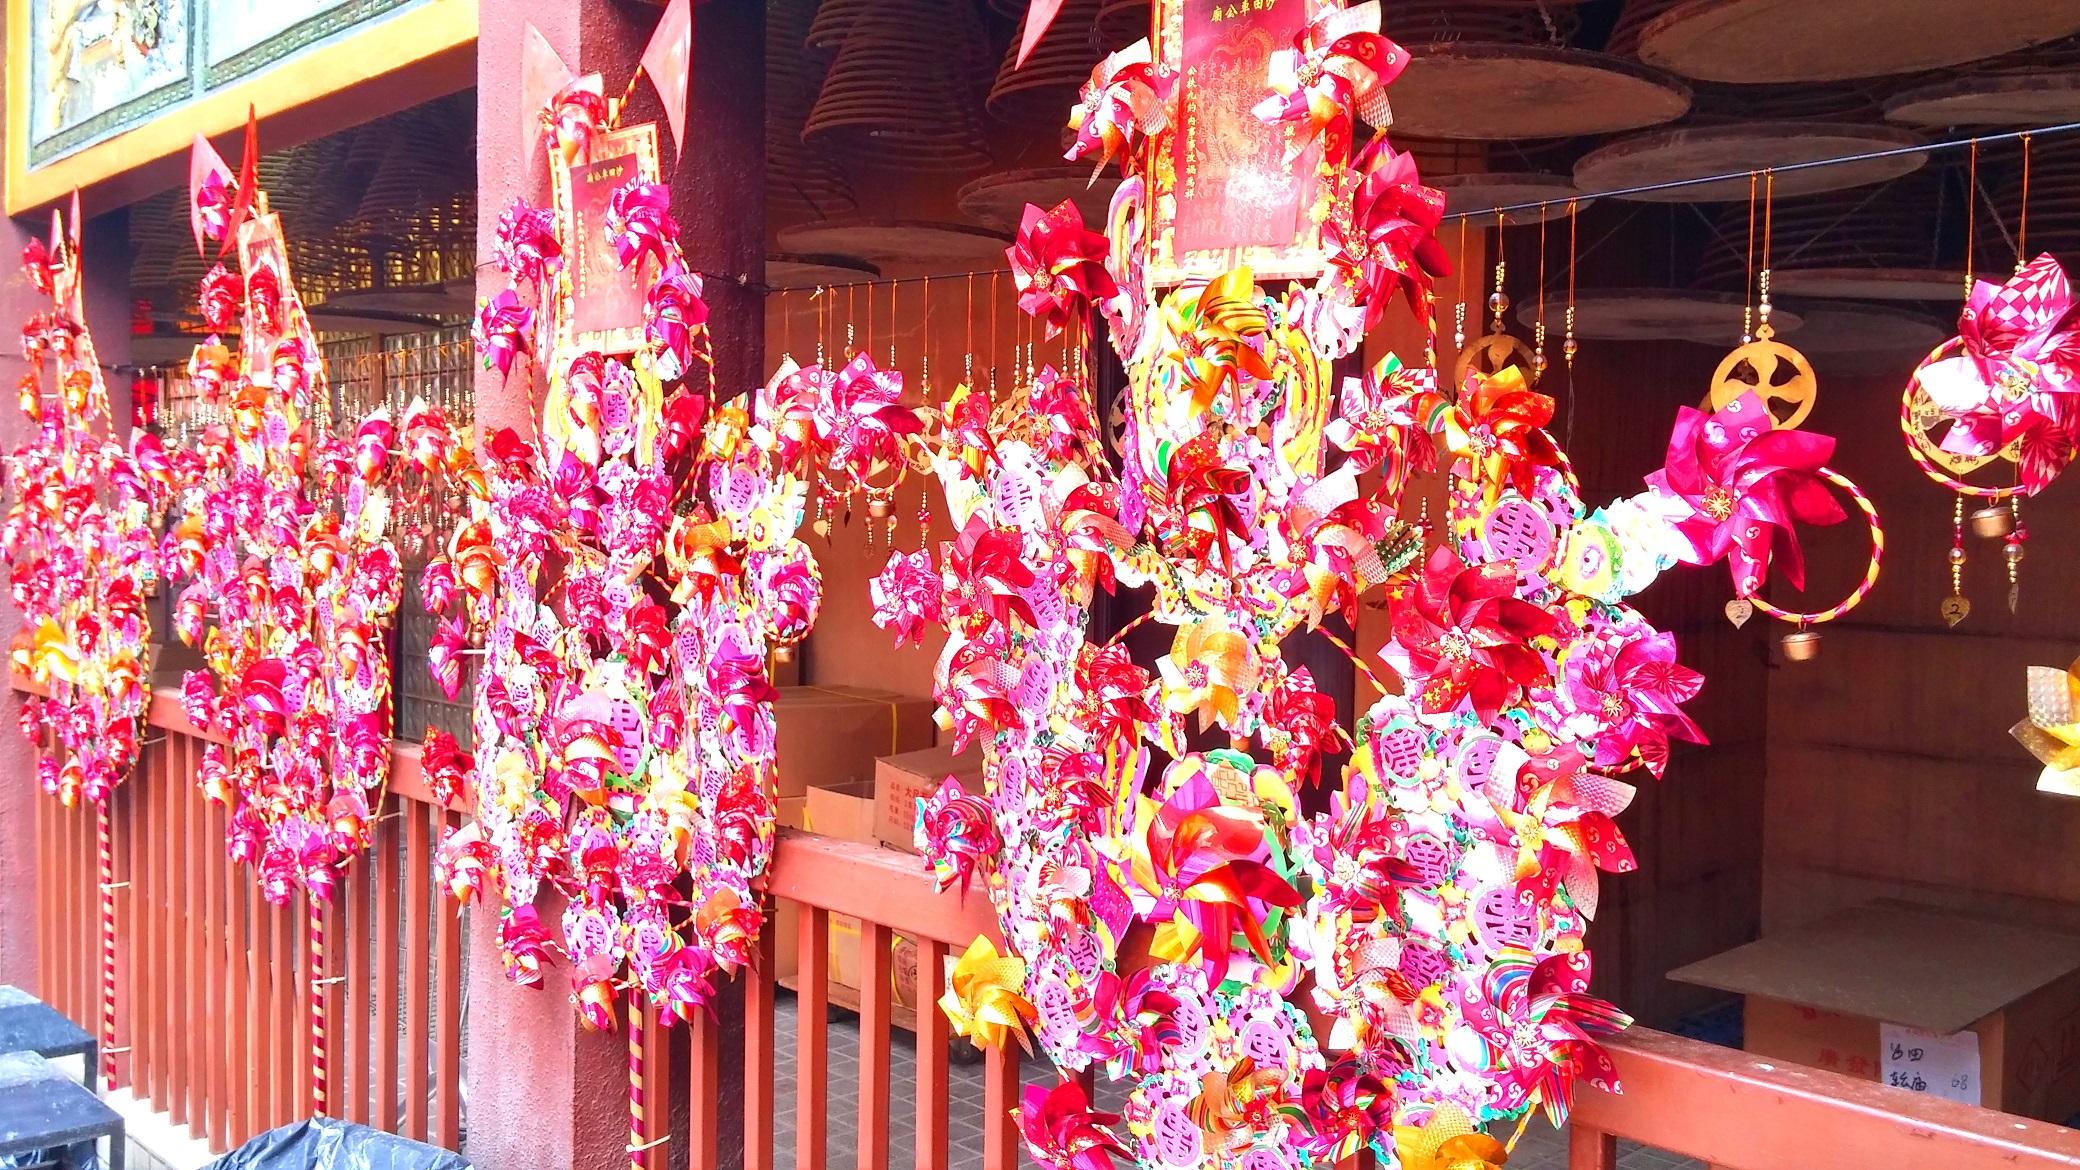 Colorful paper pinwheel